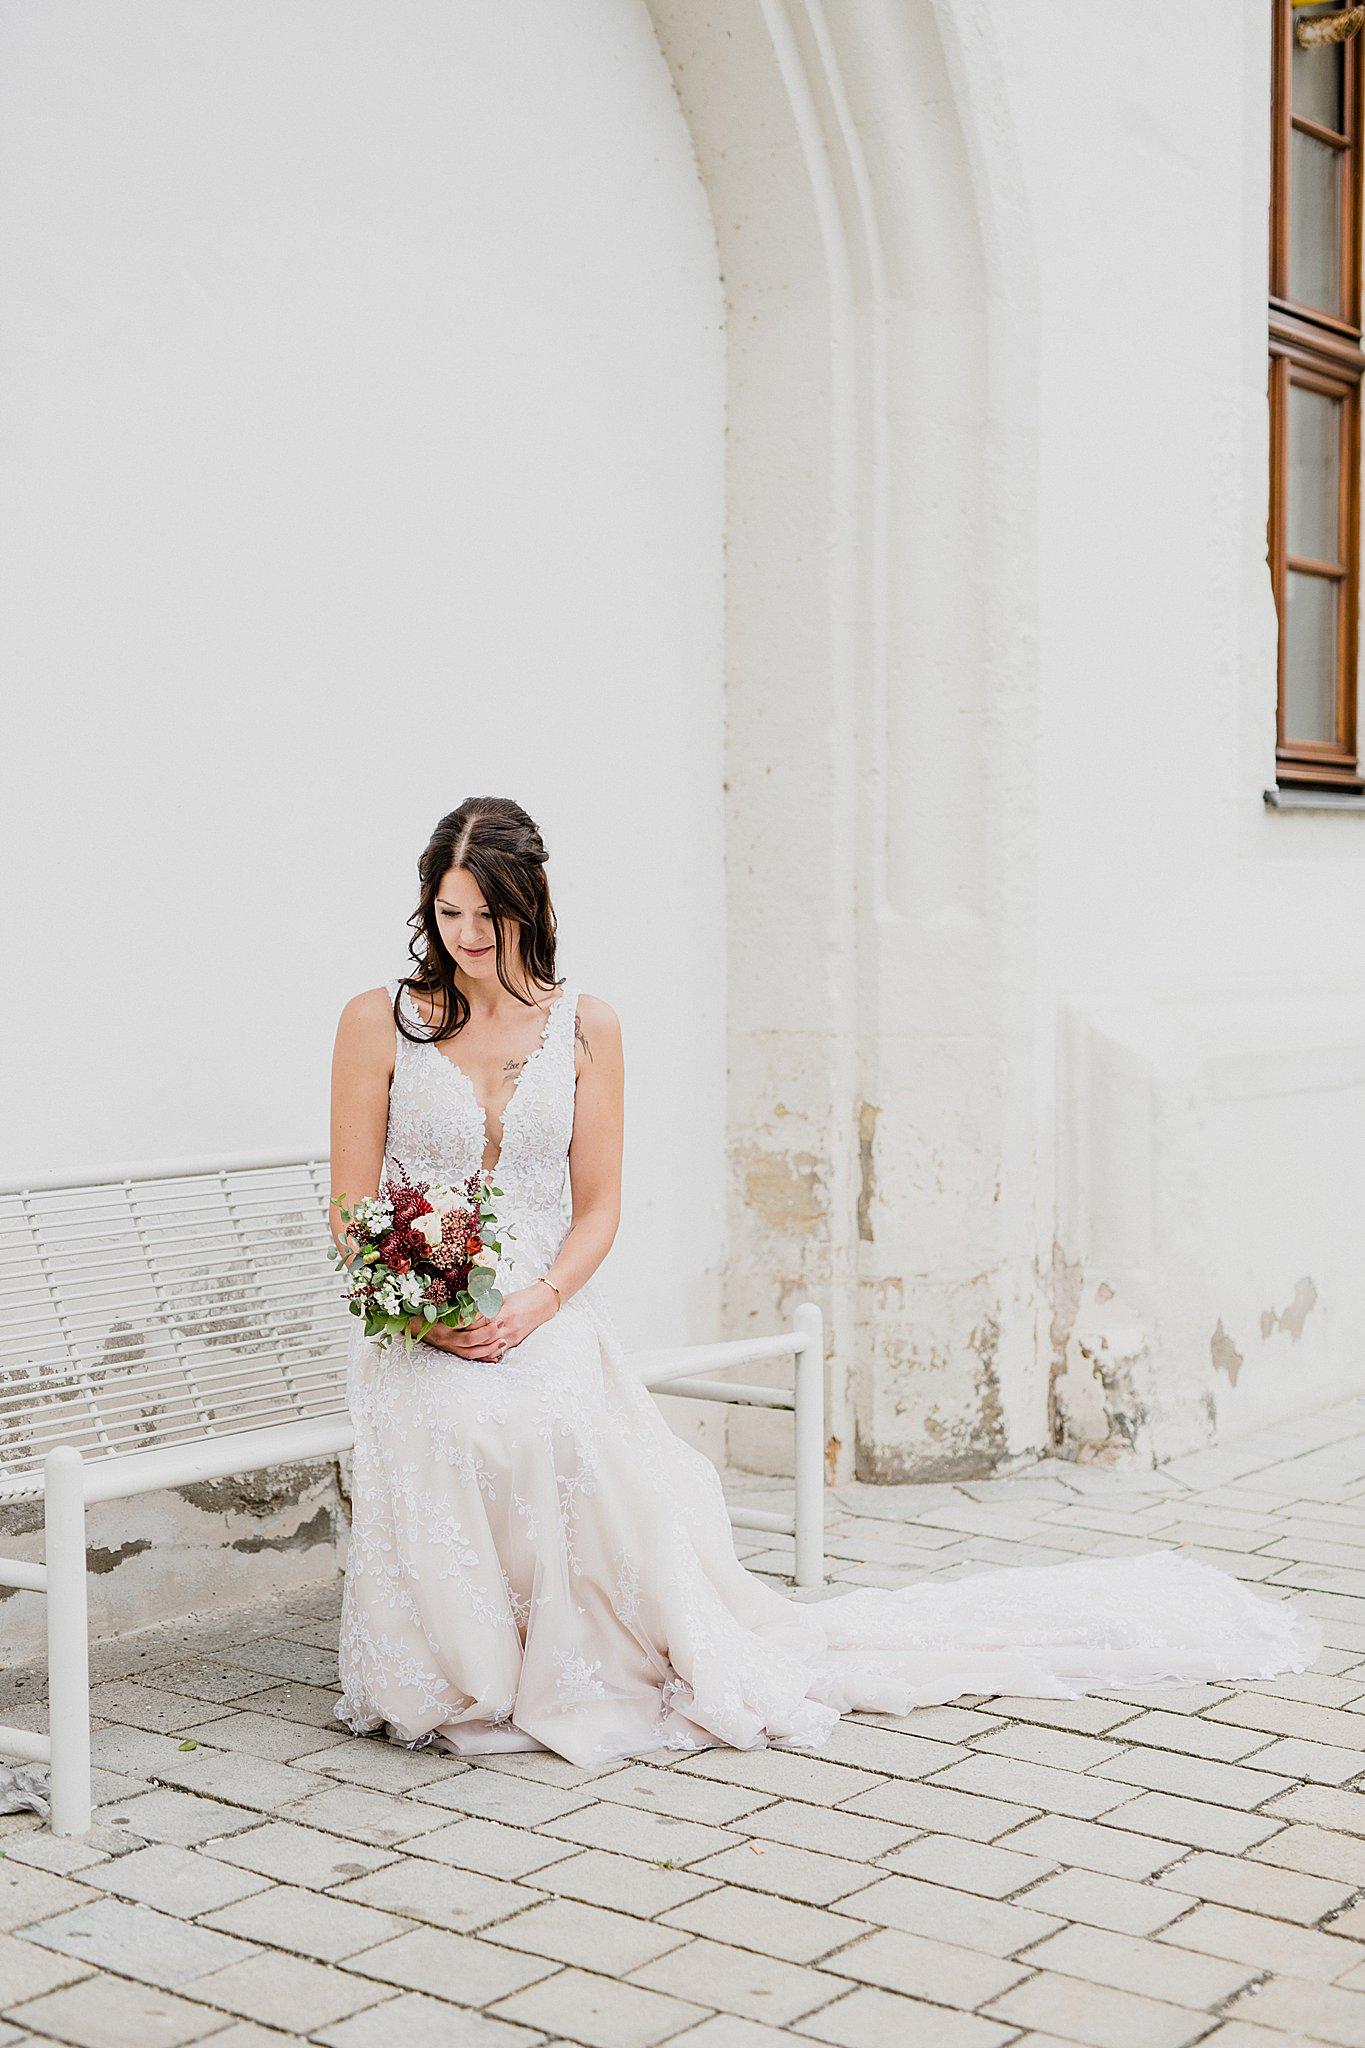 Hochzeitsfotograf-Oberpfalz-Bayern-Amberg_2675